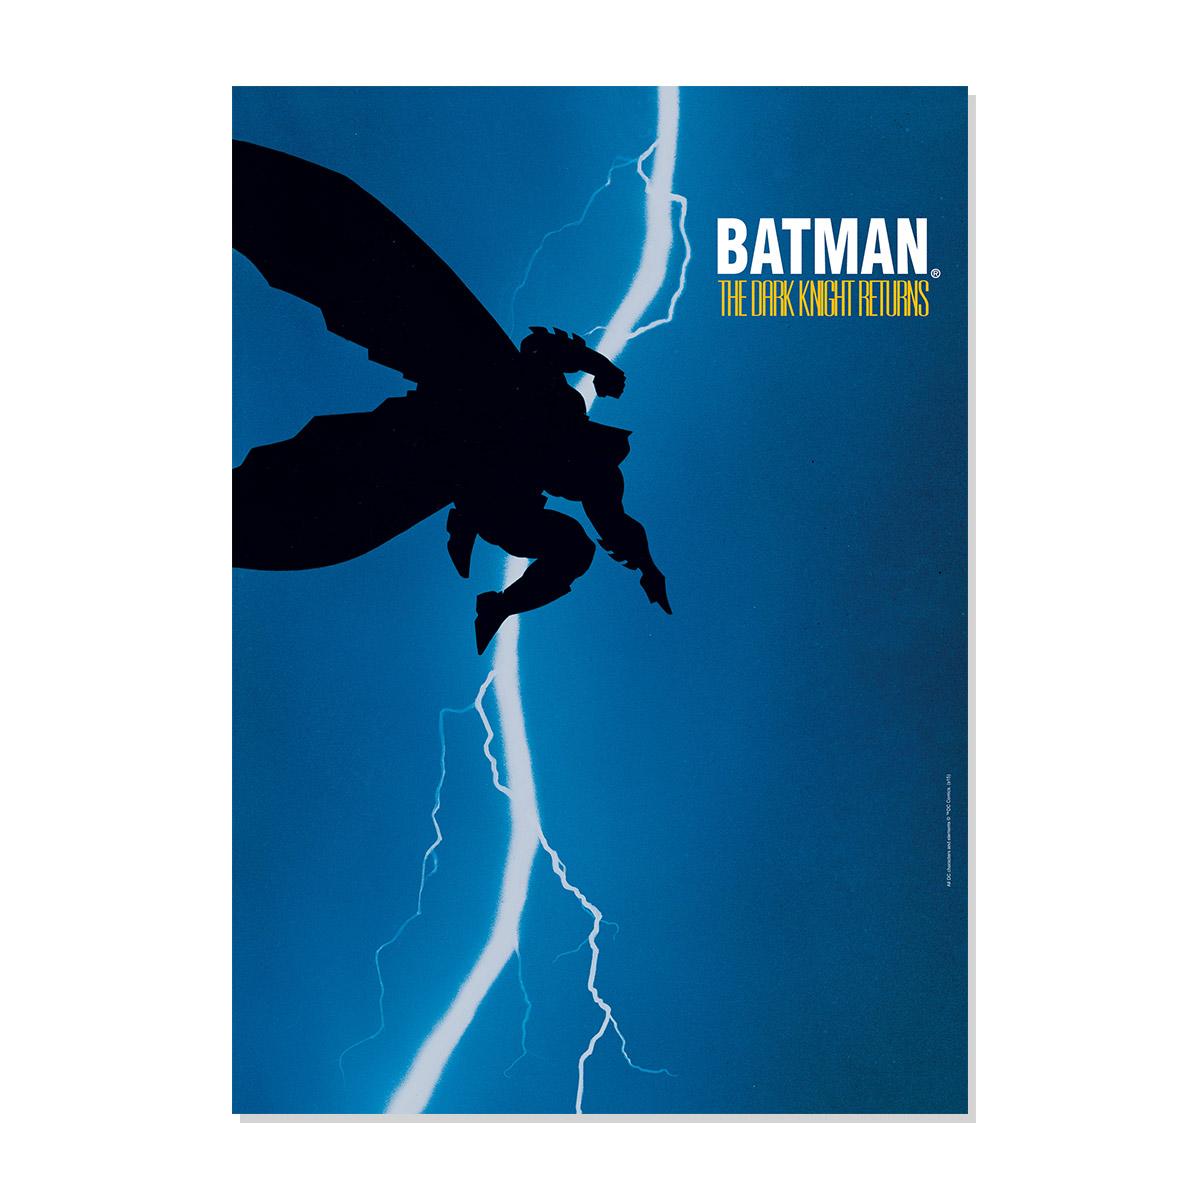 Pôster Batman Frank Miller